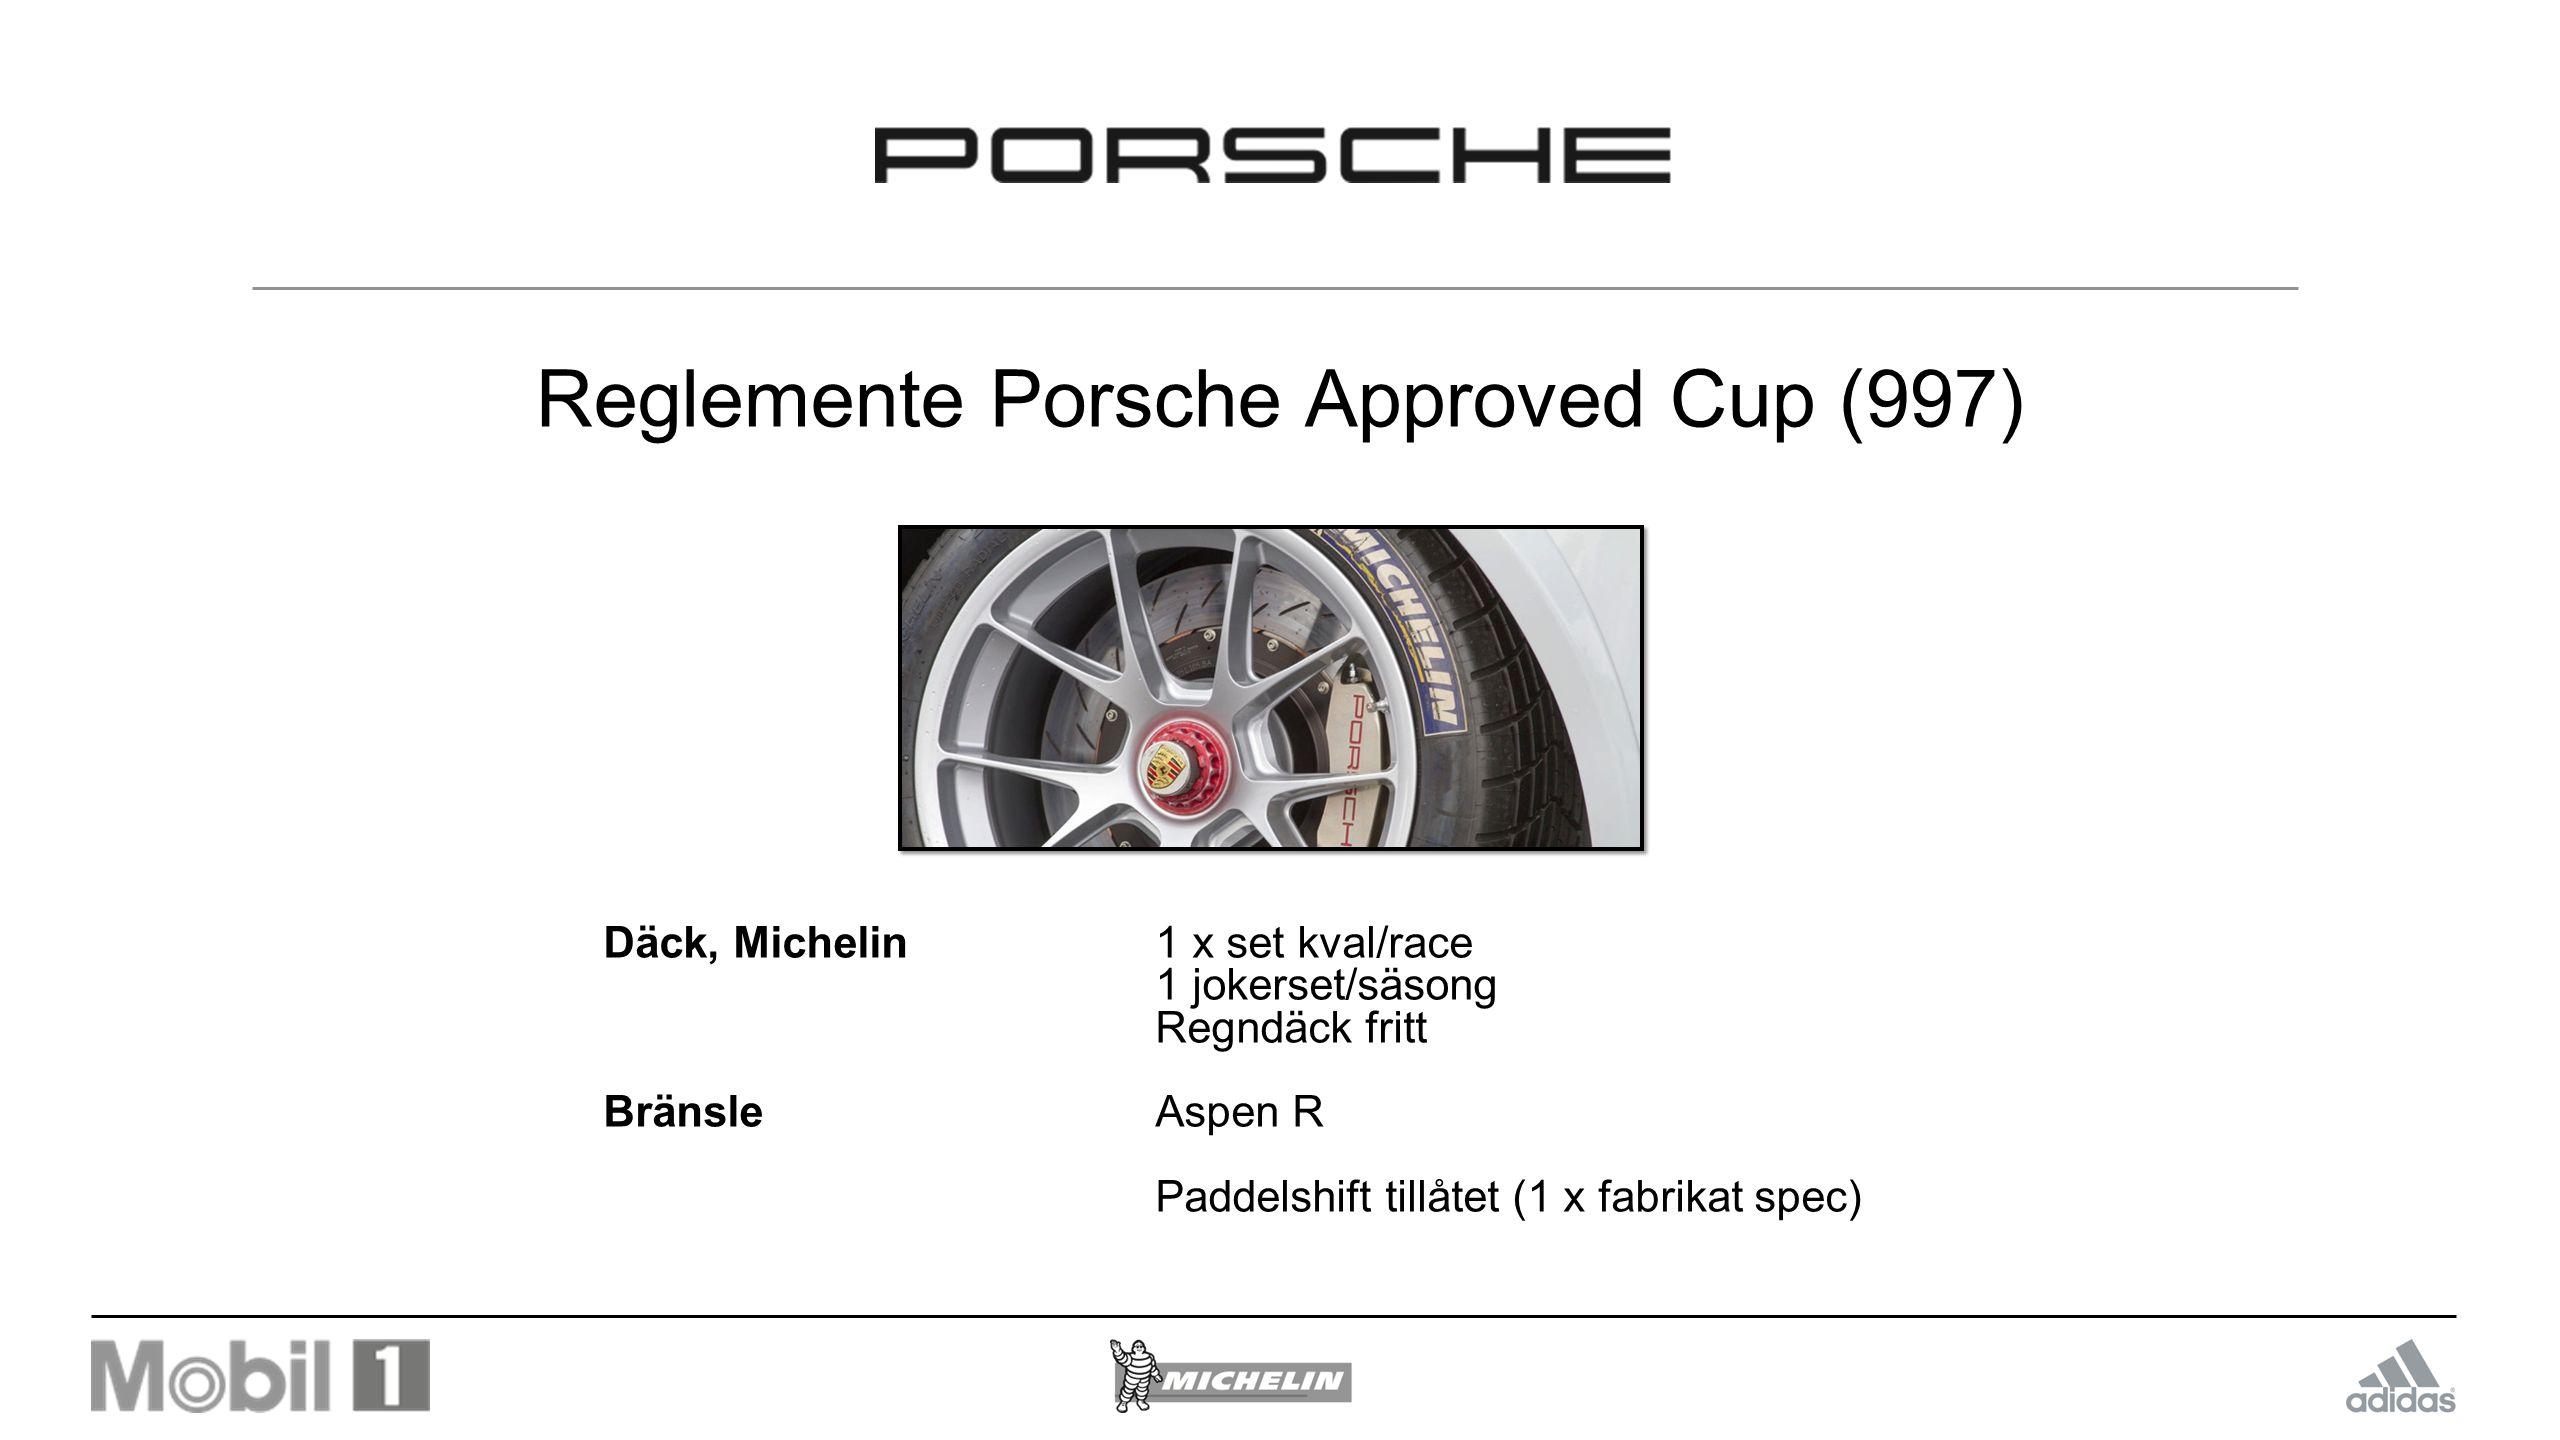 Reglemente Porsche Approved Cup (997) Däck, Michelin 1 x set kval/race 1 jokerset/säsong Regndäck fritt BränsleAspen R Paddelshift tillåtet (1 x fabrikat spec)